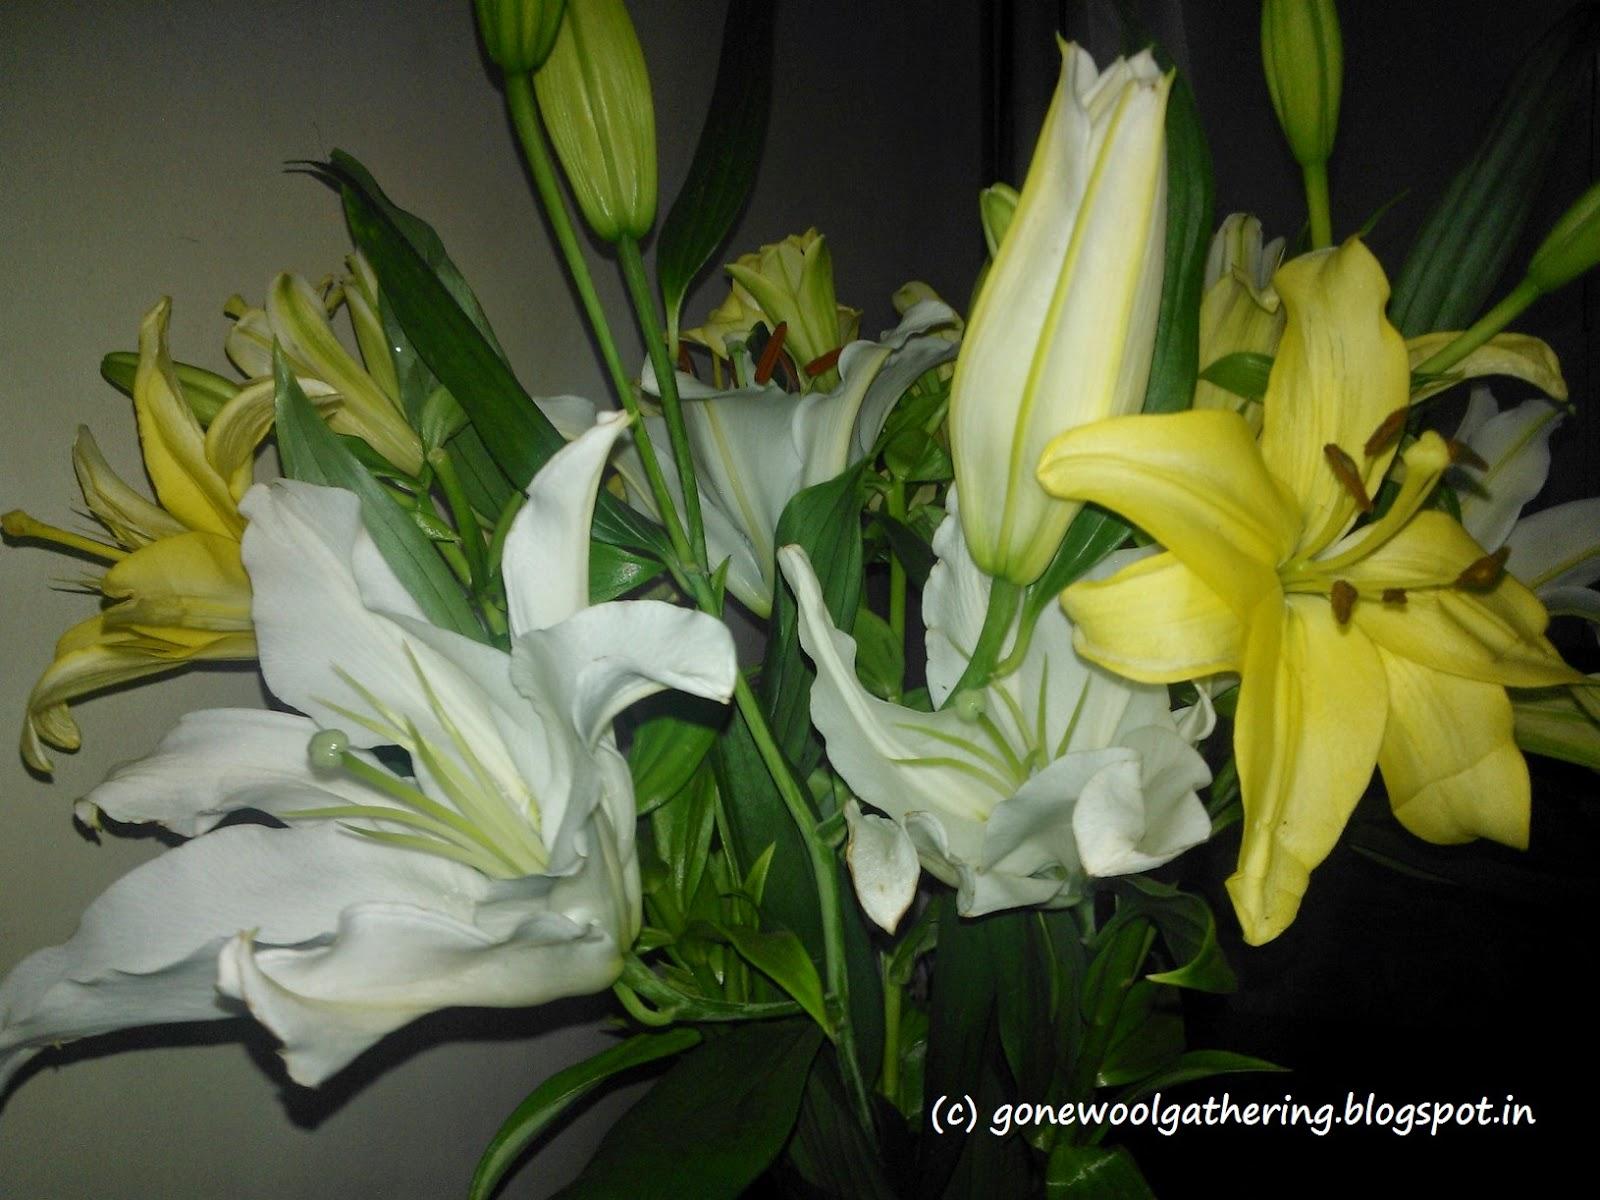 lilies, gonewoolgathering.blogspot.in